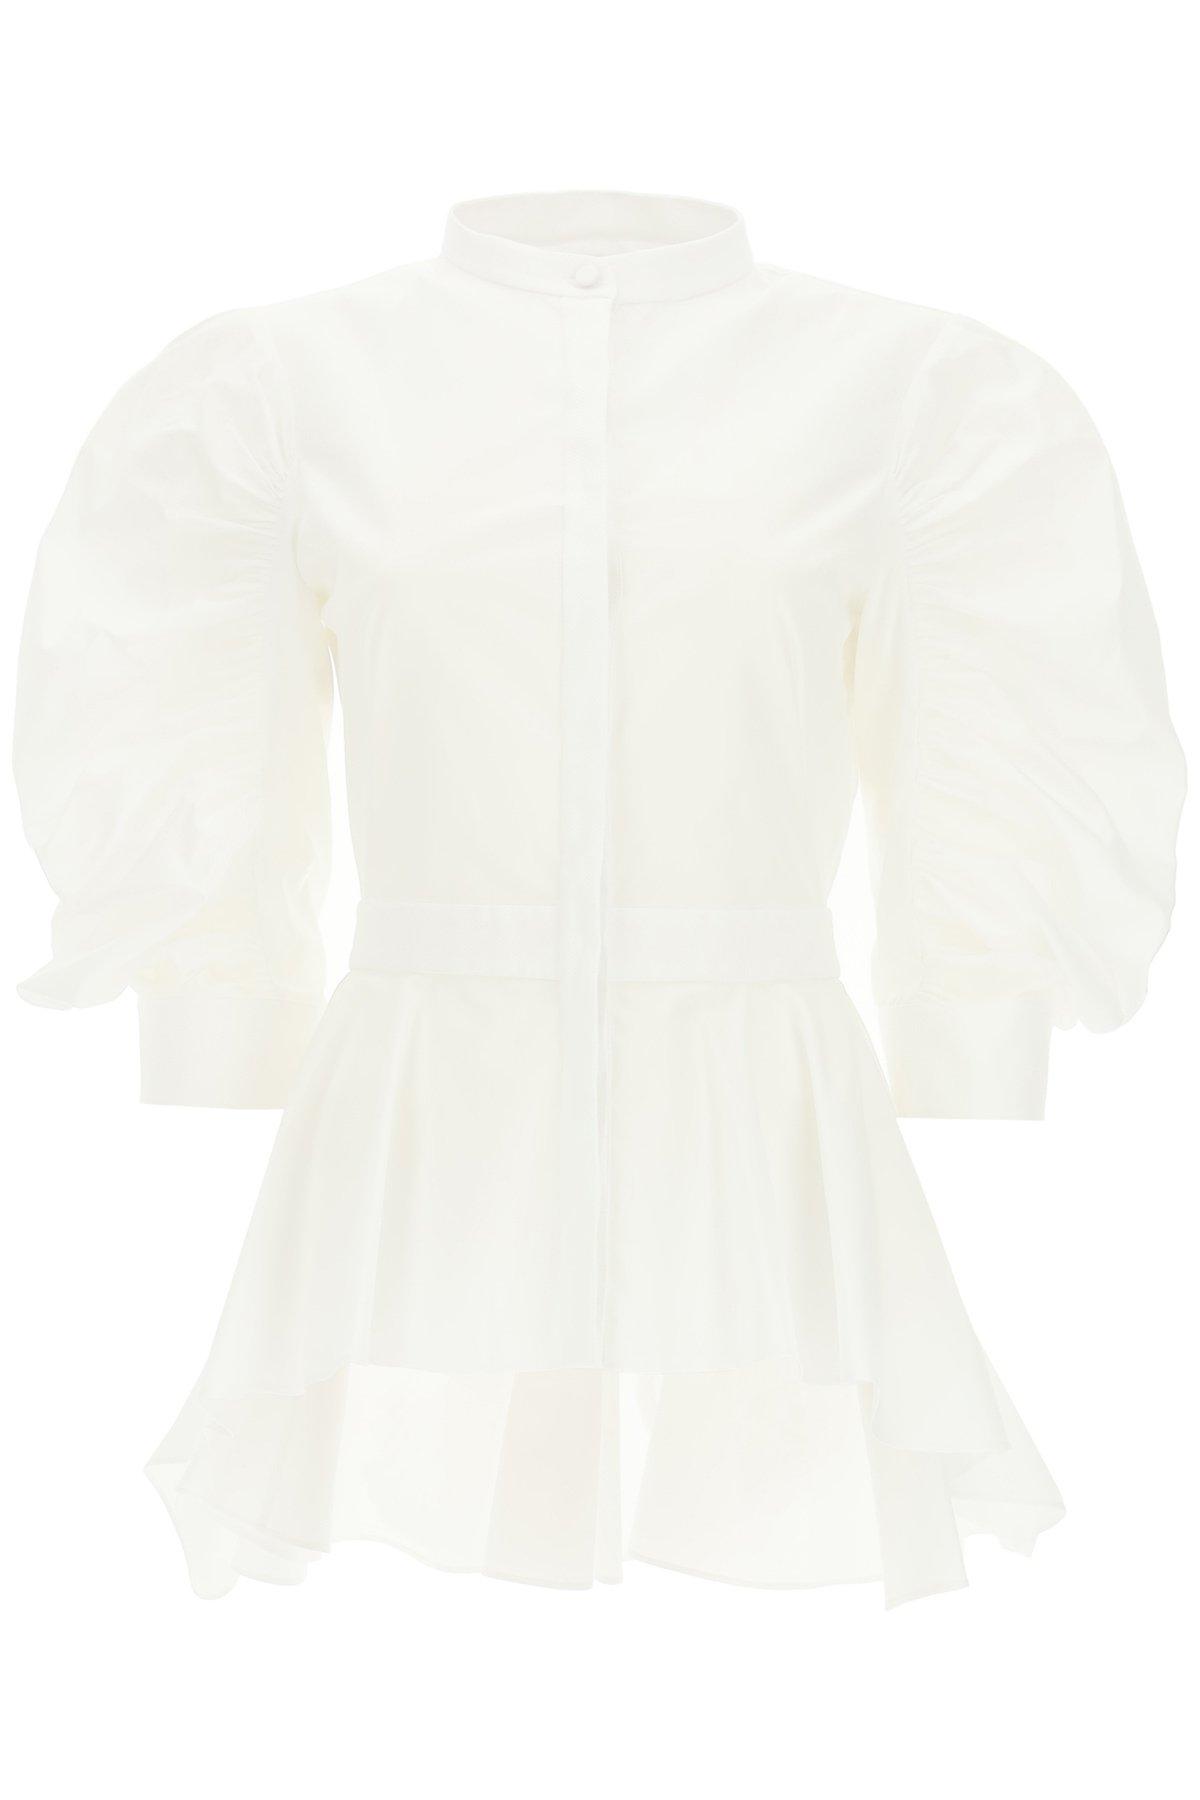 Alexander mcqueen camicia in cotone con peplum